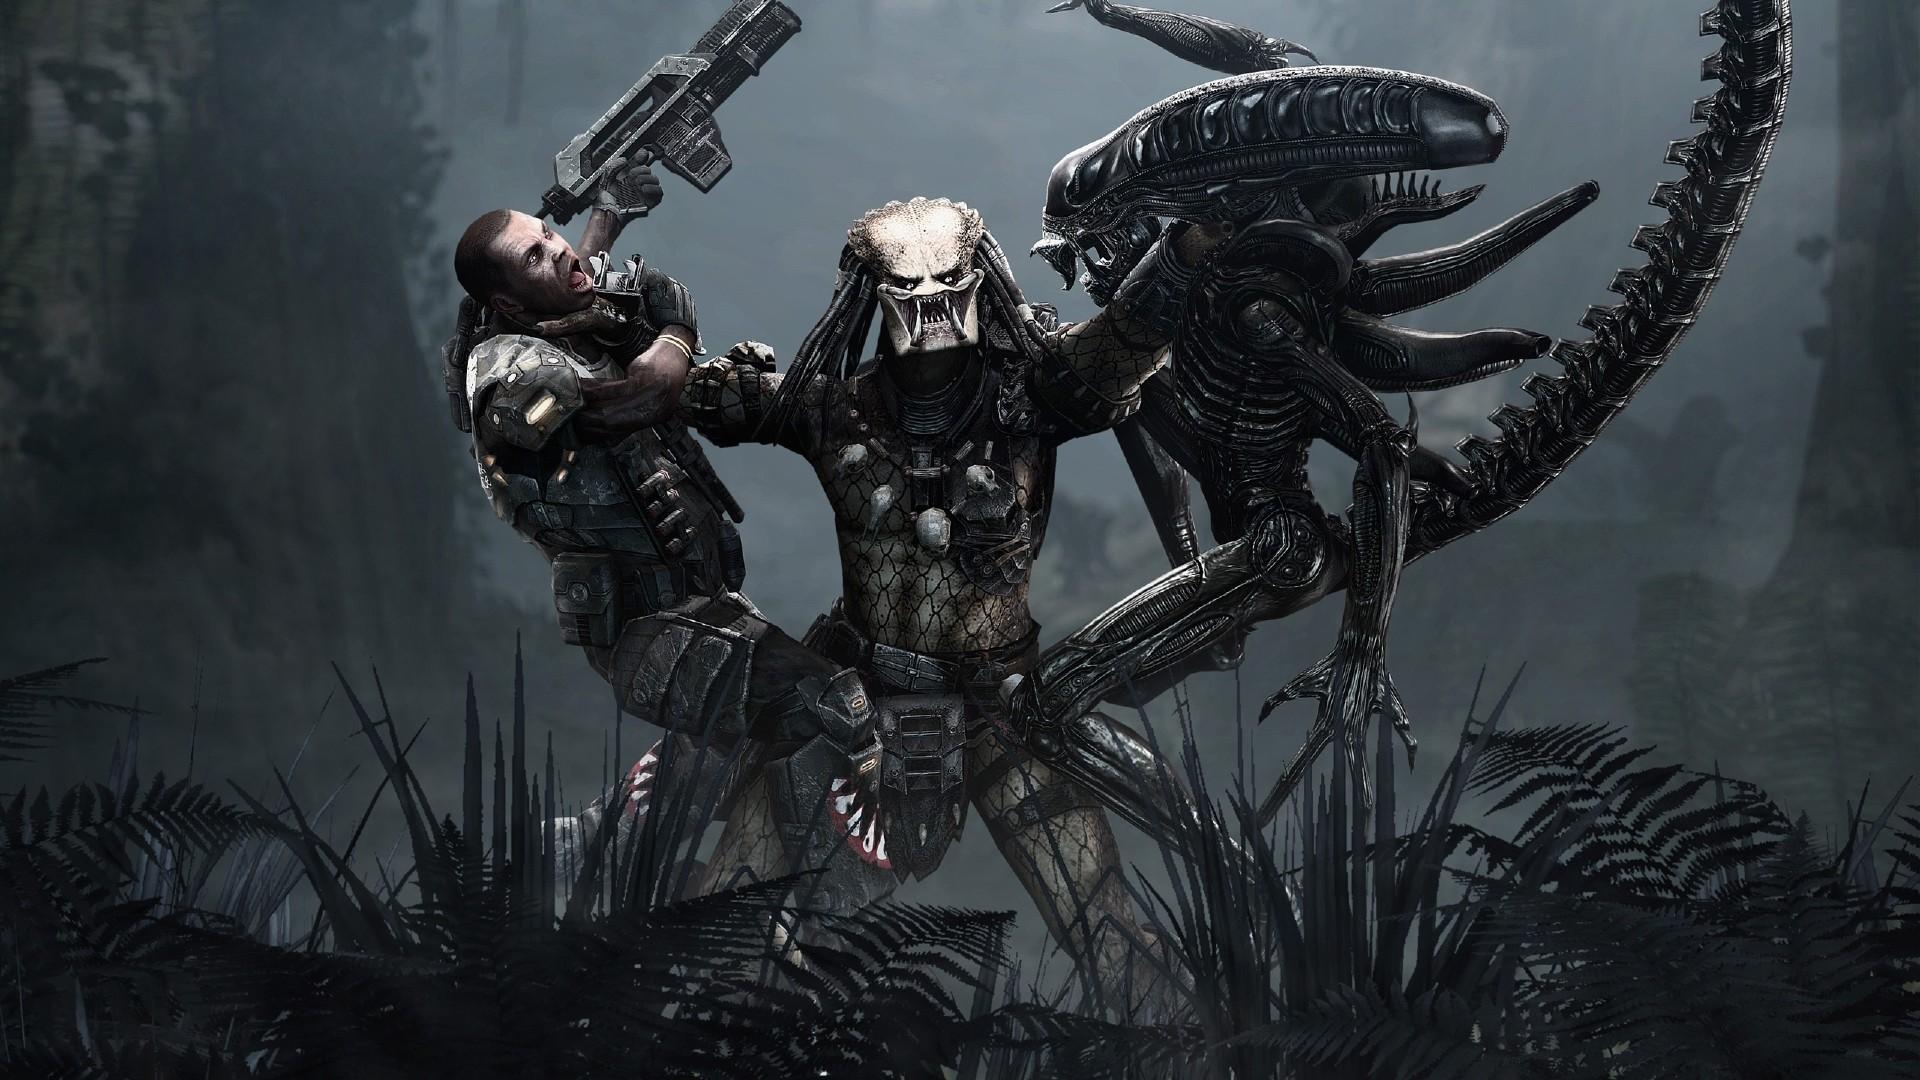 … Full HD Wallpaper alien vs predator scramble monster jungle rifle .